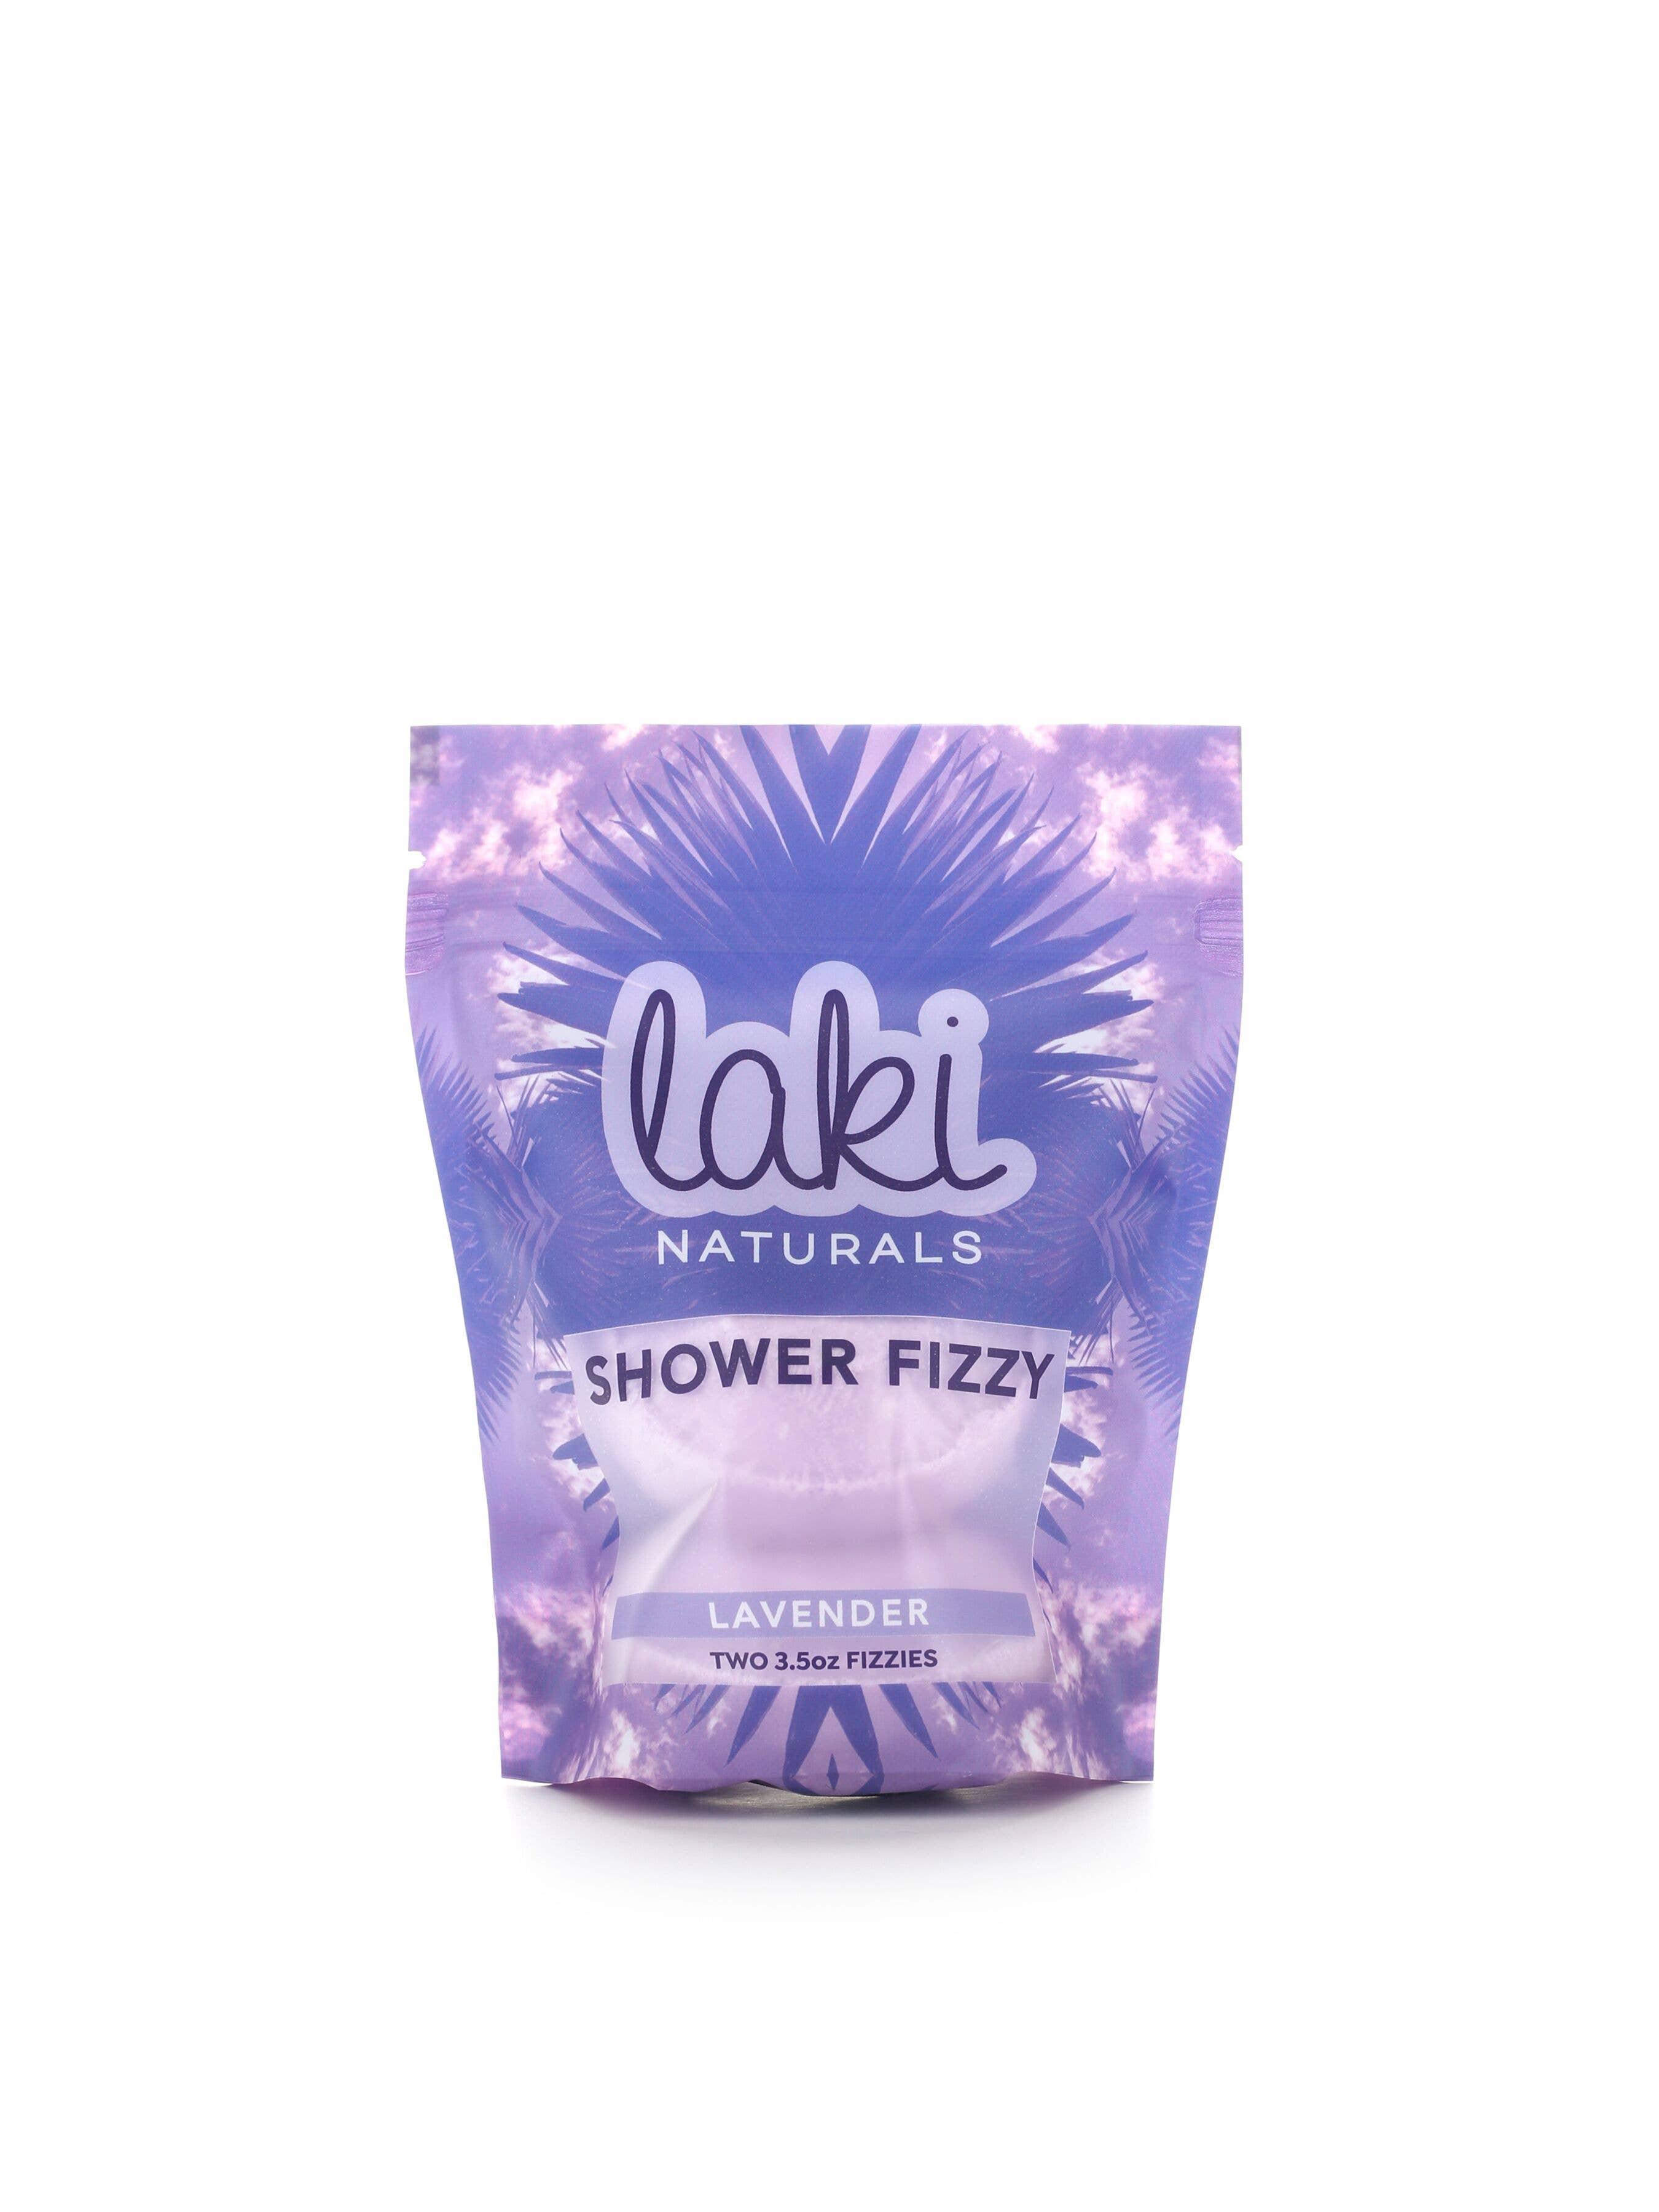 Lavender Shower Fizzy | Trada Marketplace